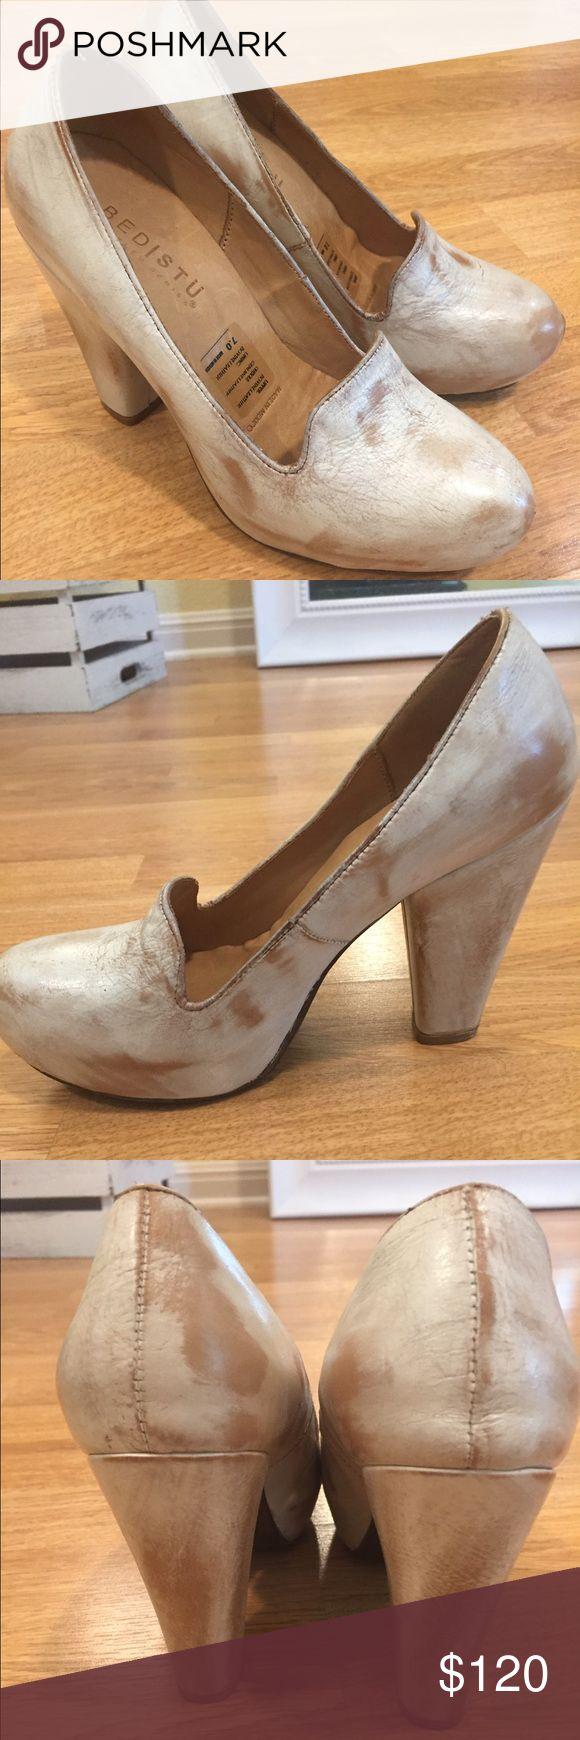 Bed Stu Molly pearl pumps. Beautiful pearl, vintage-looking pumps. Brand new, never worn. Bed Stu Shoes Heels